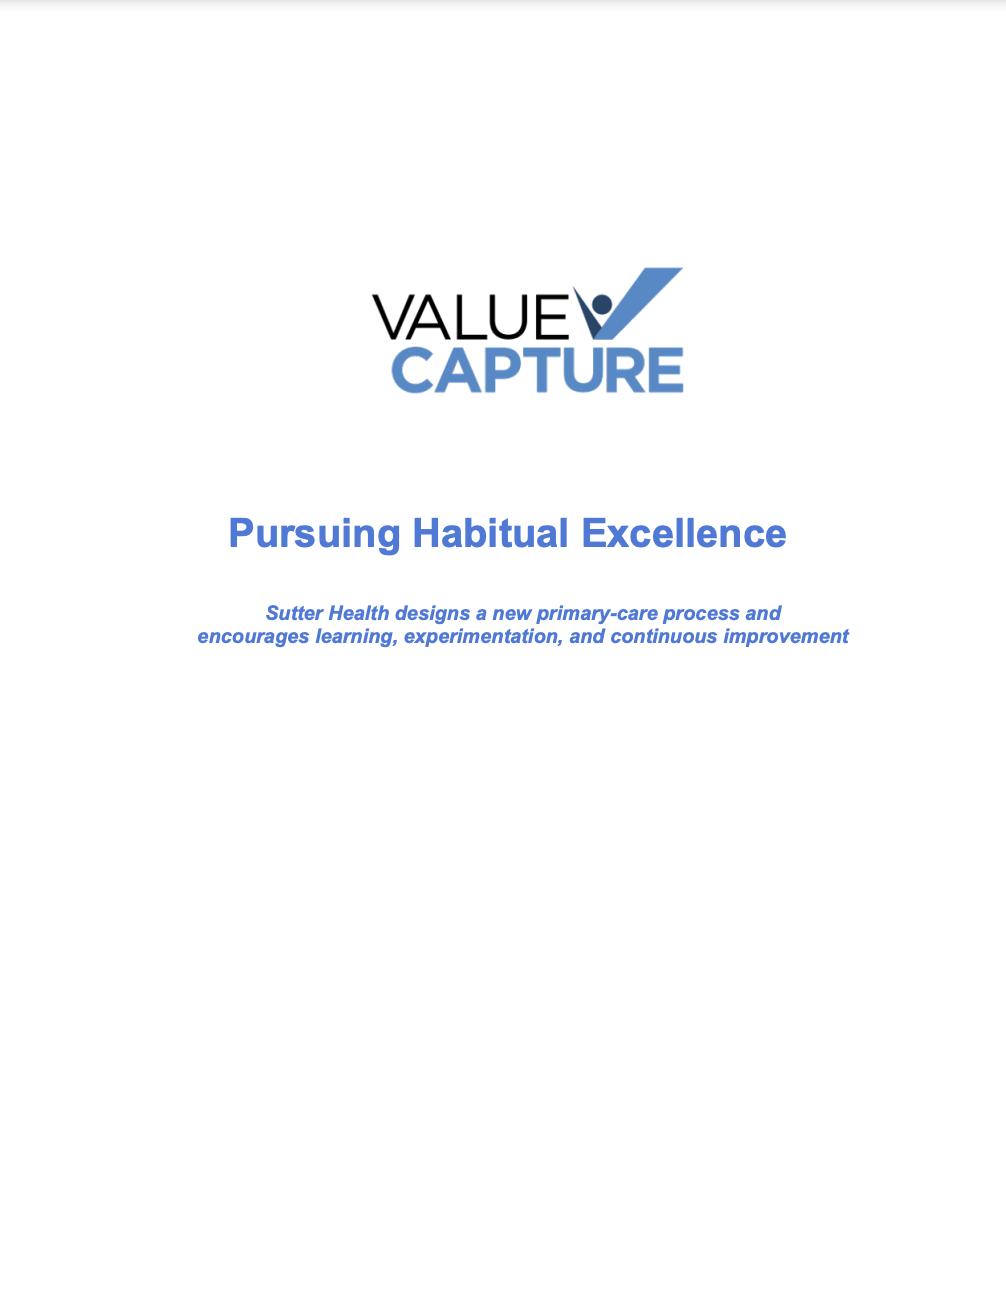 Value Capture Sutter Health White Paper